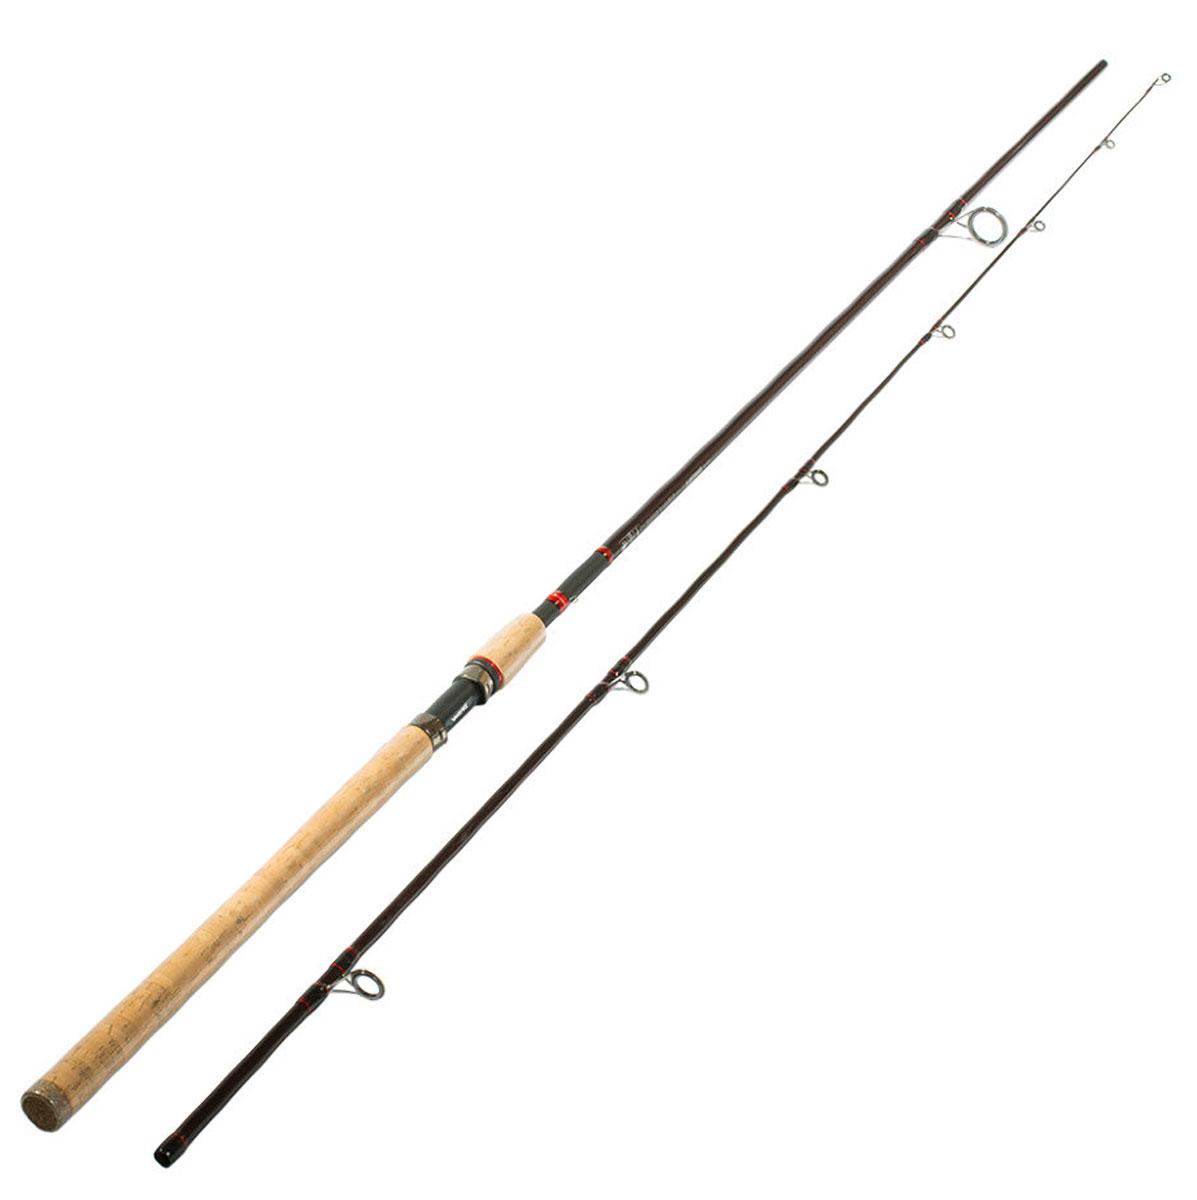 Спиннинг штекерный Daiwa Sweepfire, 2,1 м, 5-25 г удилище спиннинговое daiwa sweepfire sw902mlfs